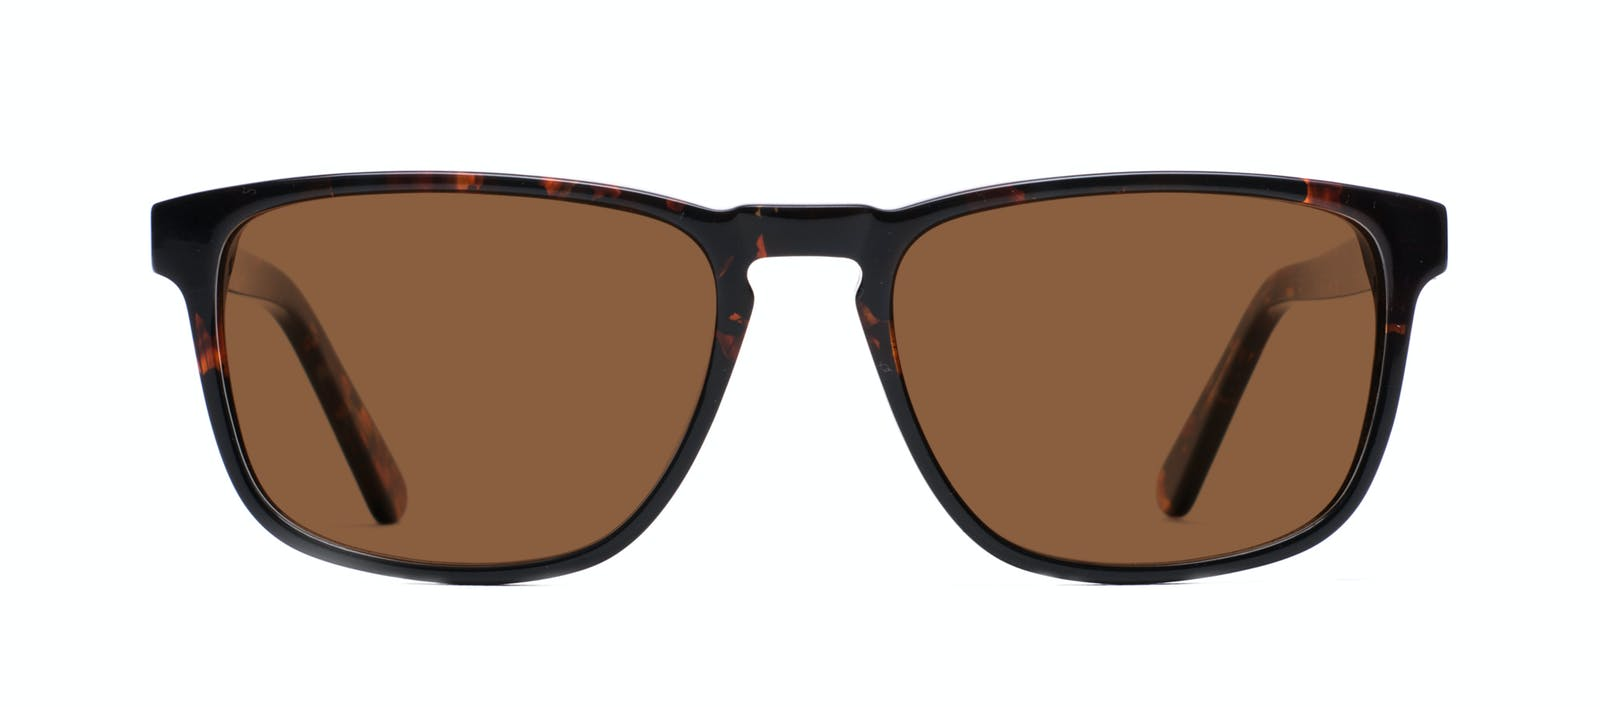 d70d4010506 Affordable Fashion Glasses Rectangle Sunglasses Men Loft Mahogany Black  Front